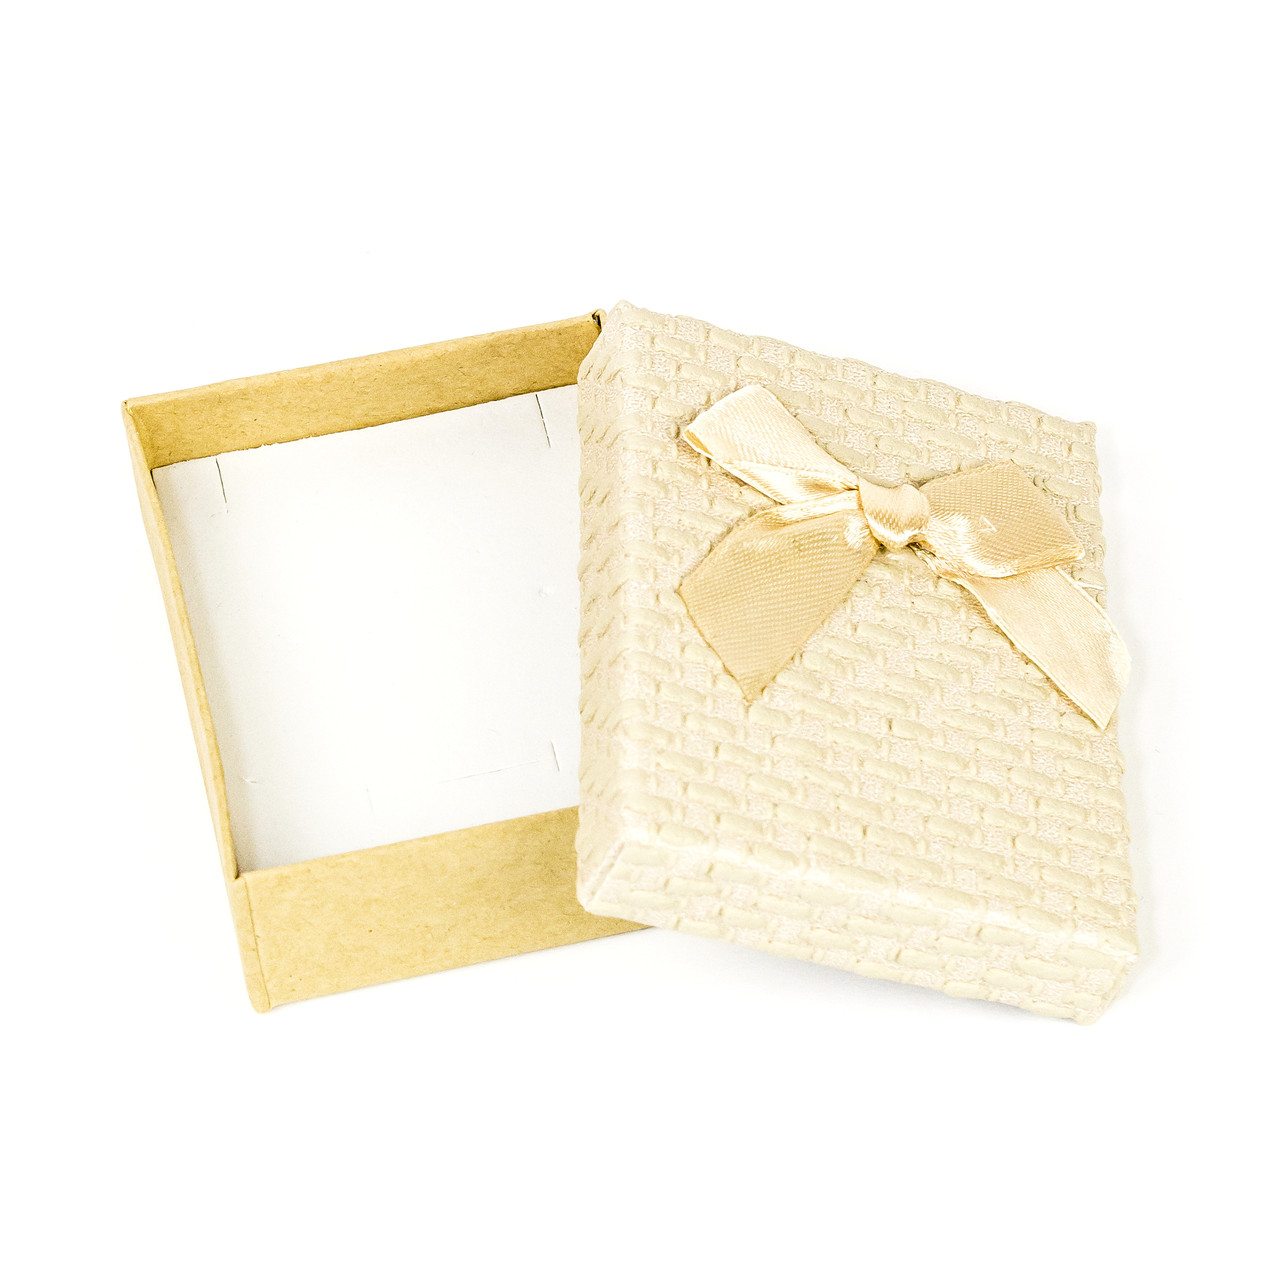 Подарочная коробка под бижутерию из фактурного картона бежевая 9 х 7 х 3 см